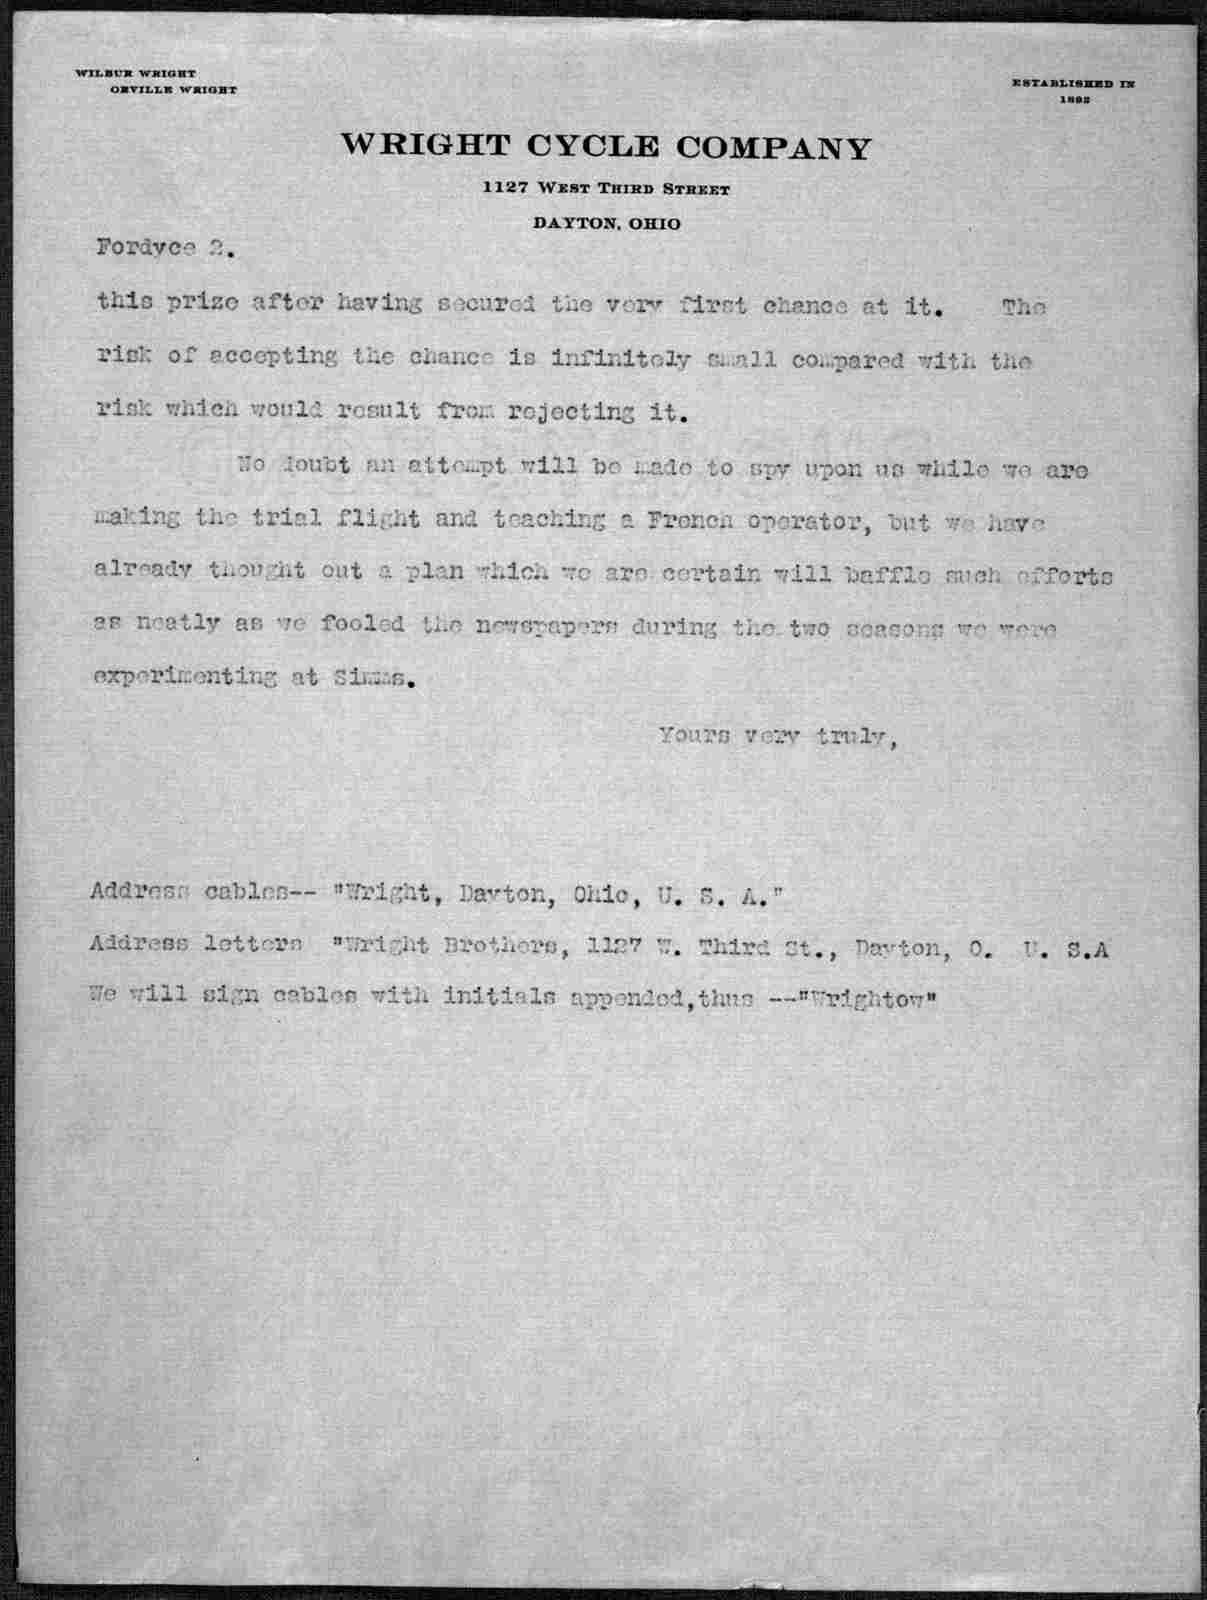 General Correspondence:  Fordyce, Arnold, 1906-1908, undated